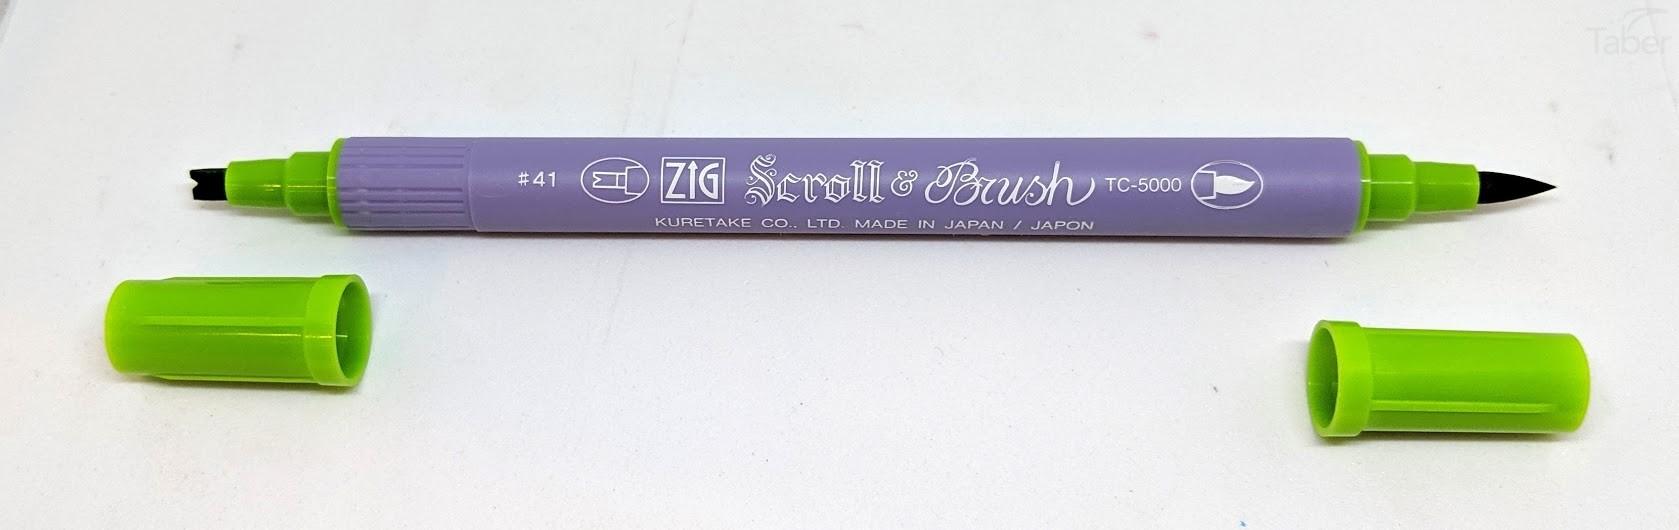 Zig Scroll and Brush Marker, Light Green